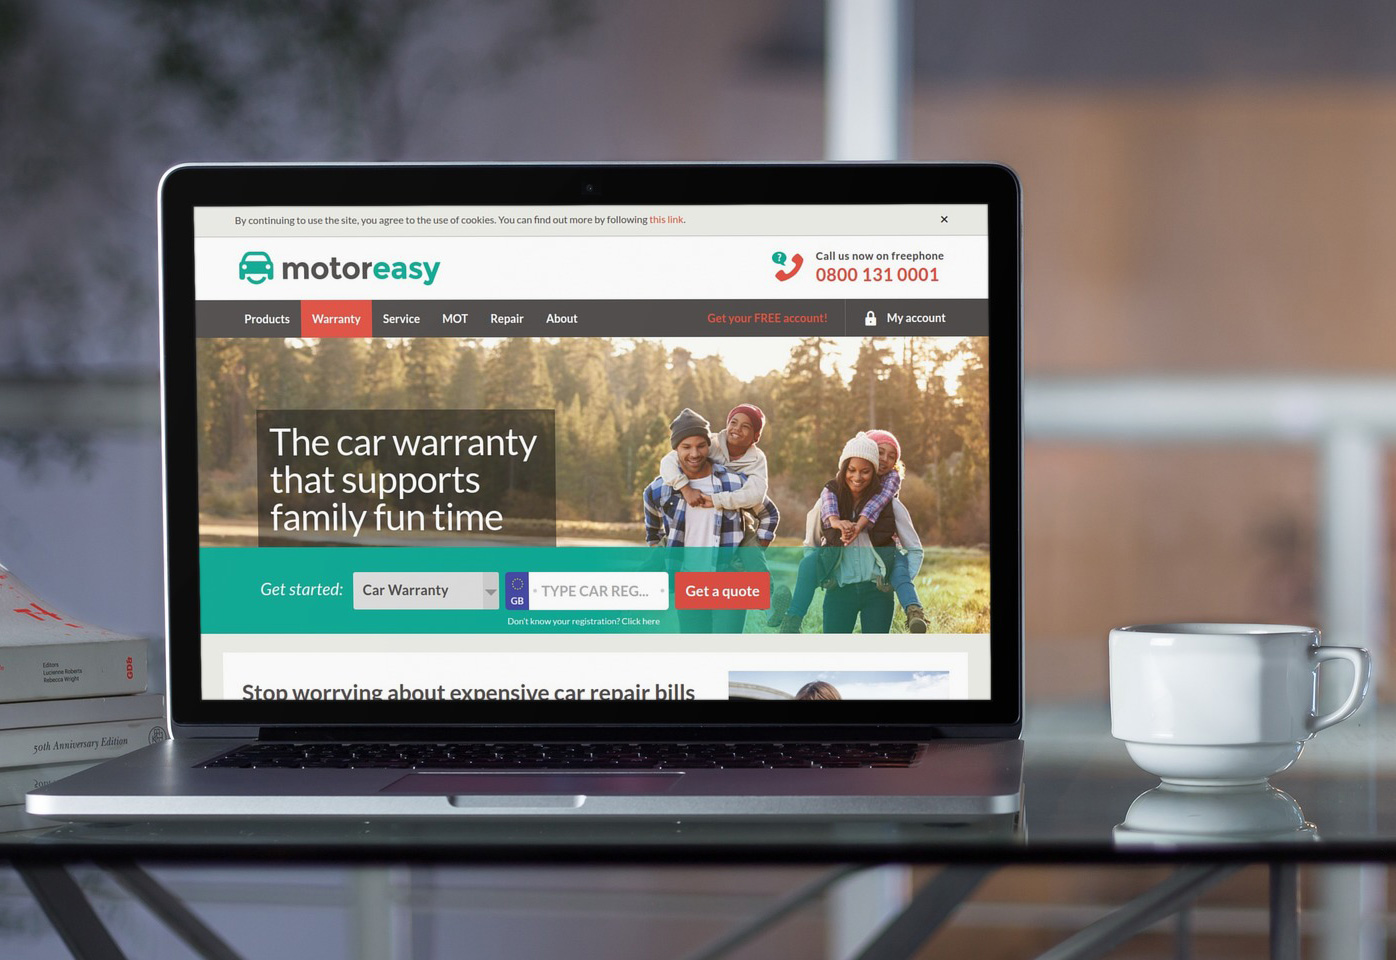 motoreasy-website-desk-warranty.jpg